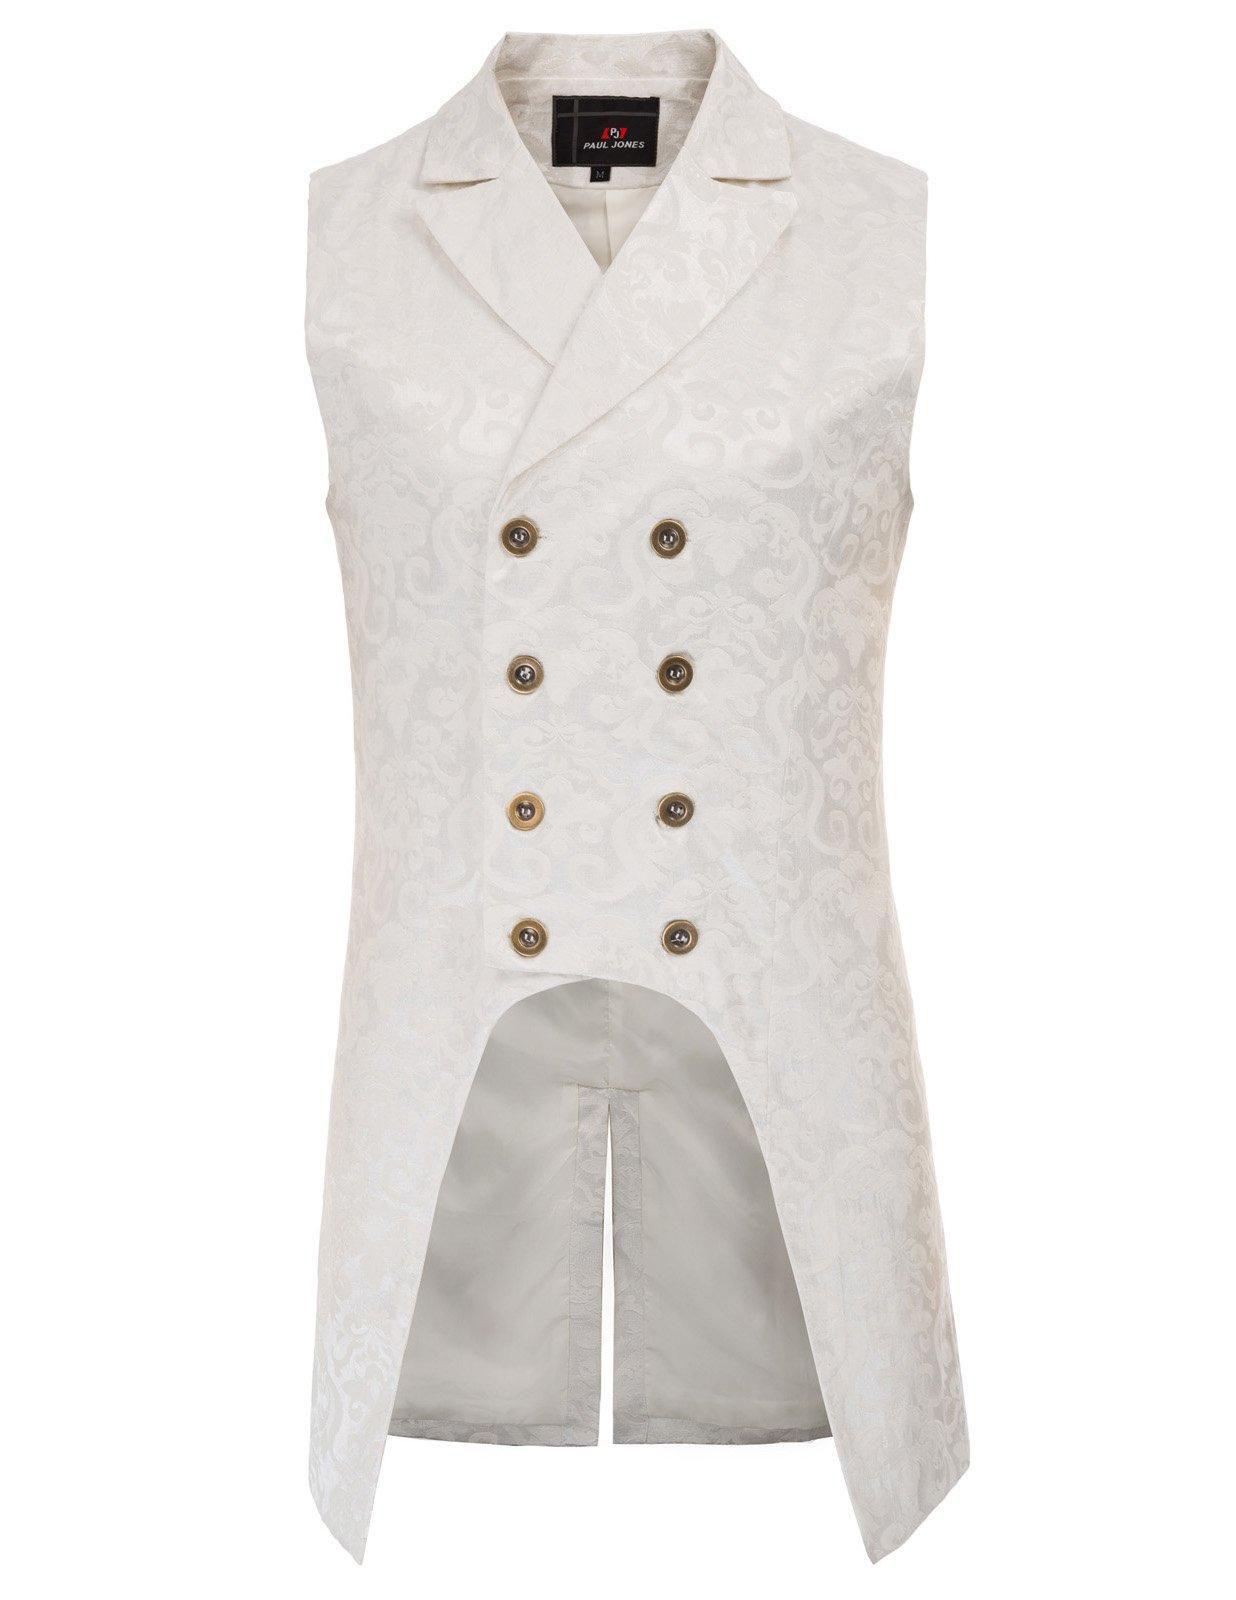 Paul Jones Mens Gothic Steampunk Double Breasted Vest Brocade Waistcoat PJ0081 4